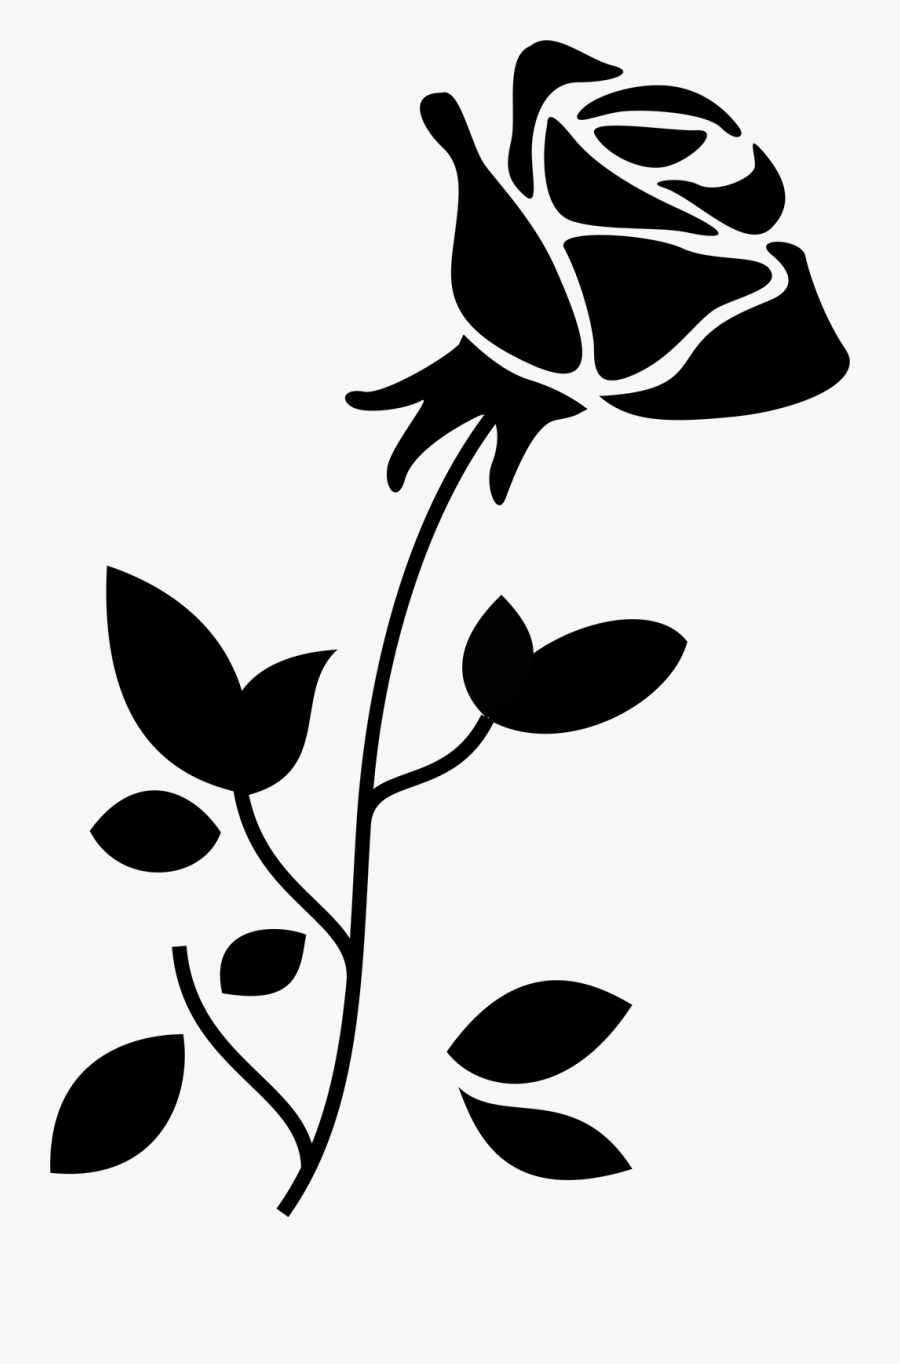 Mawar Logo : mawar, Flower, Bouquet, Paper, Embroidery, Bunga, Mawar, Transparent, Clipart, ClipartKey